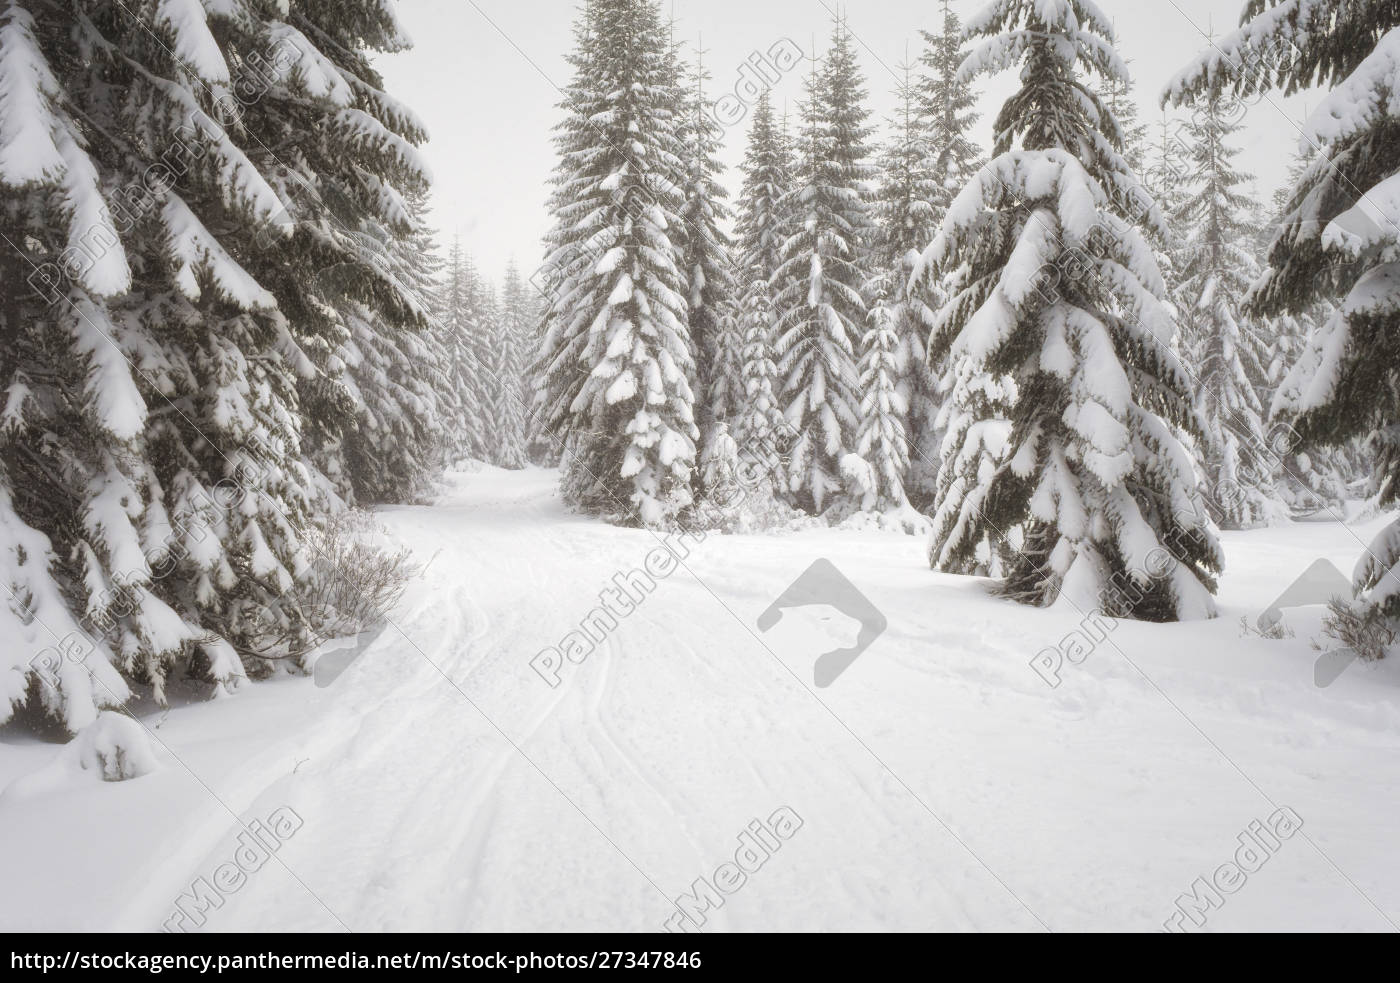 usa, washington, state, crystal, mountain, area., winterschnee. - 27347846